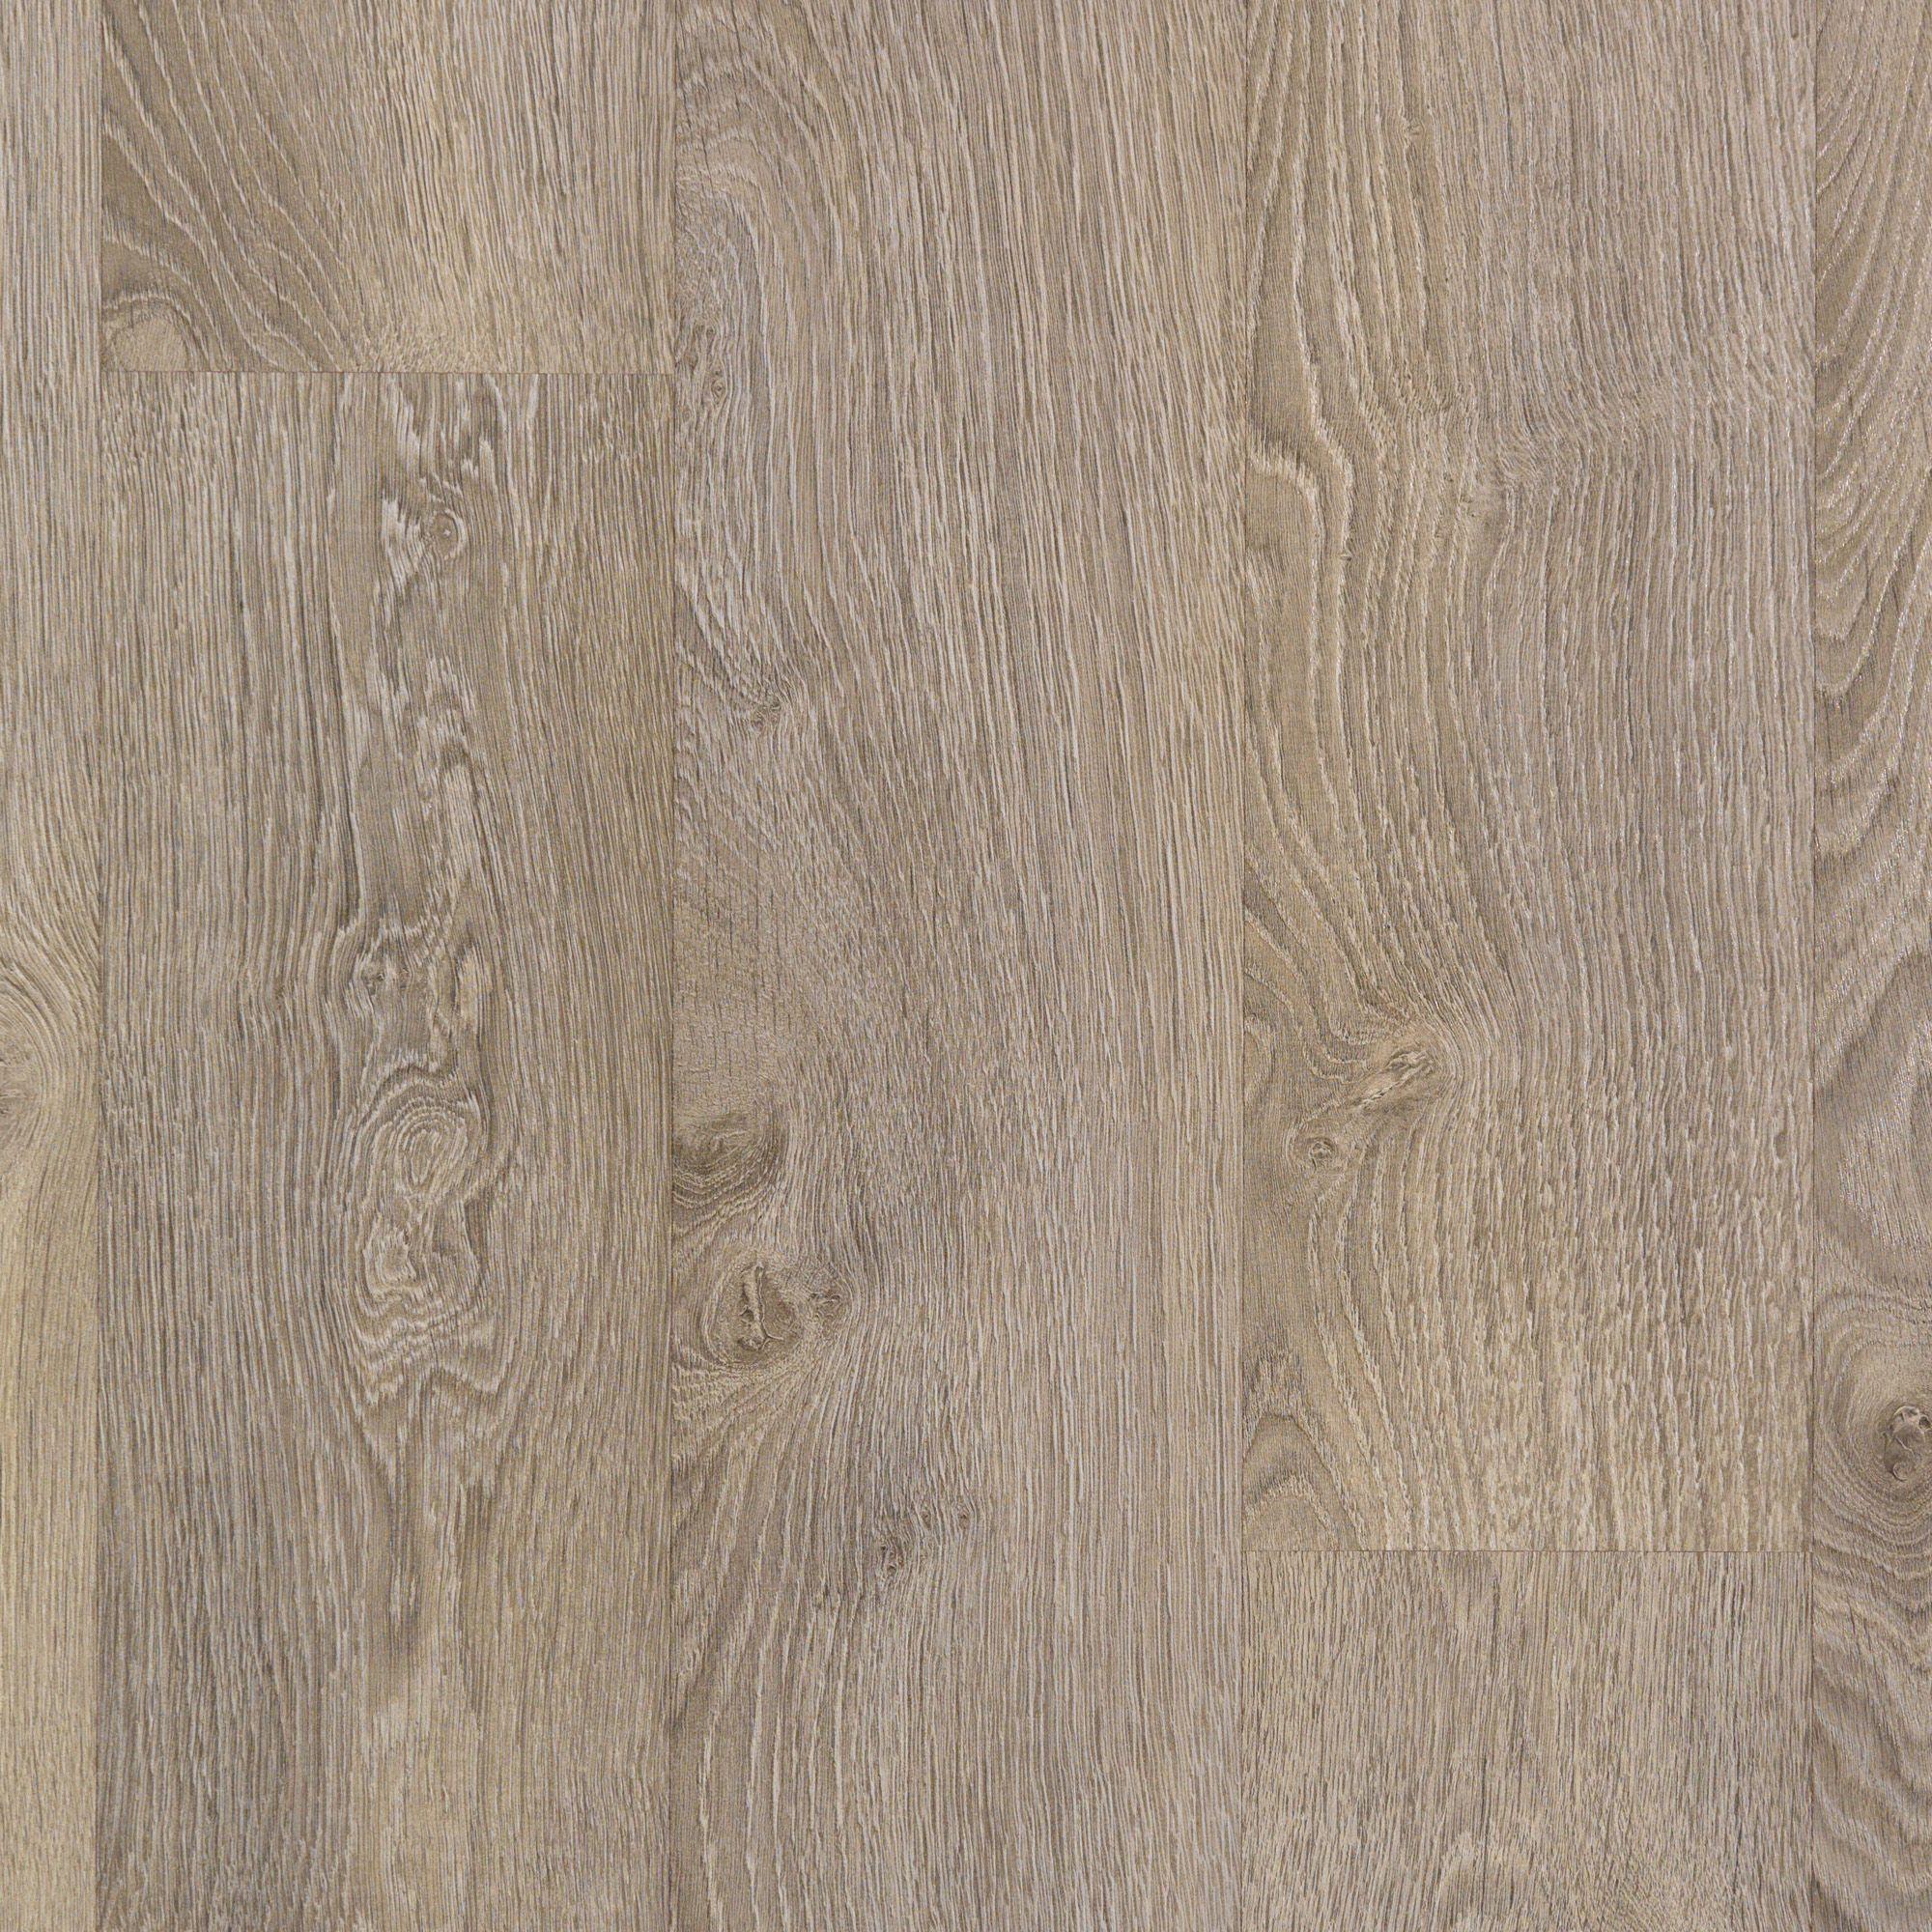 Overture Arlington Oak Effect Laminate Flooring 1 25 M 178